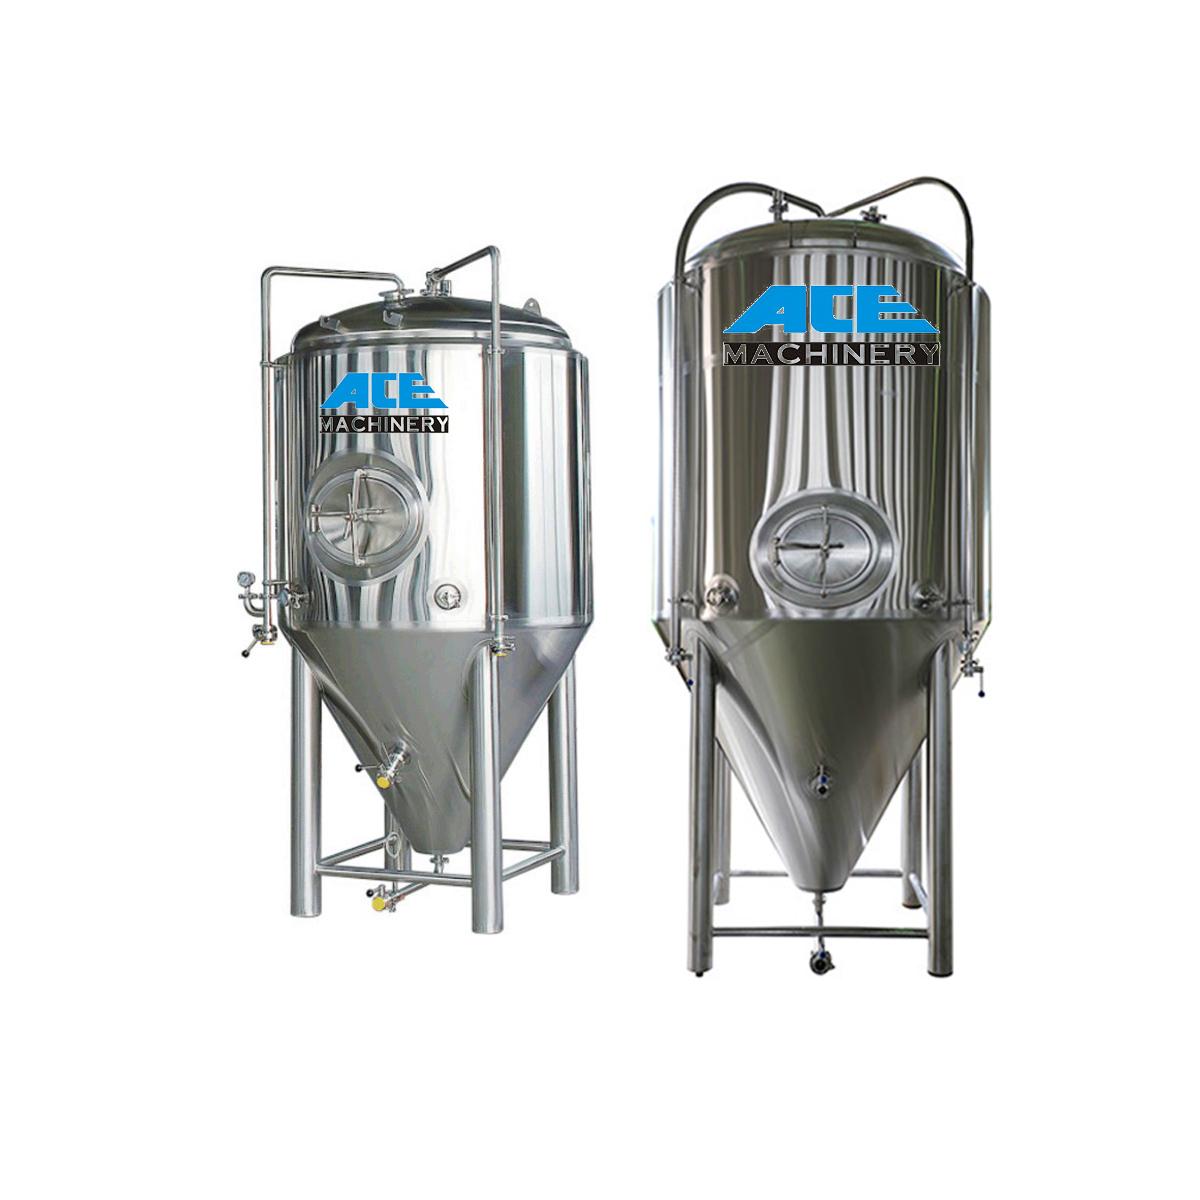 800L Time Volume Milk Fermentation Tank Price Commercial Beer Fermenter Milk Fermentation Container